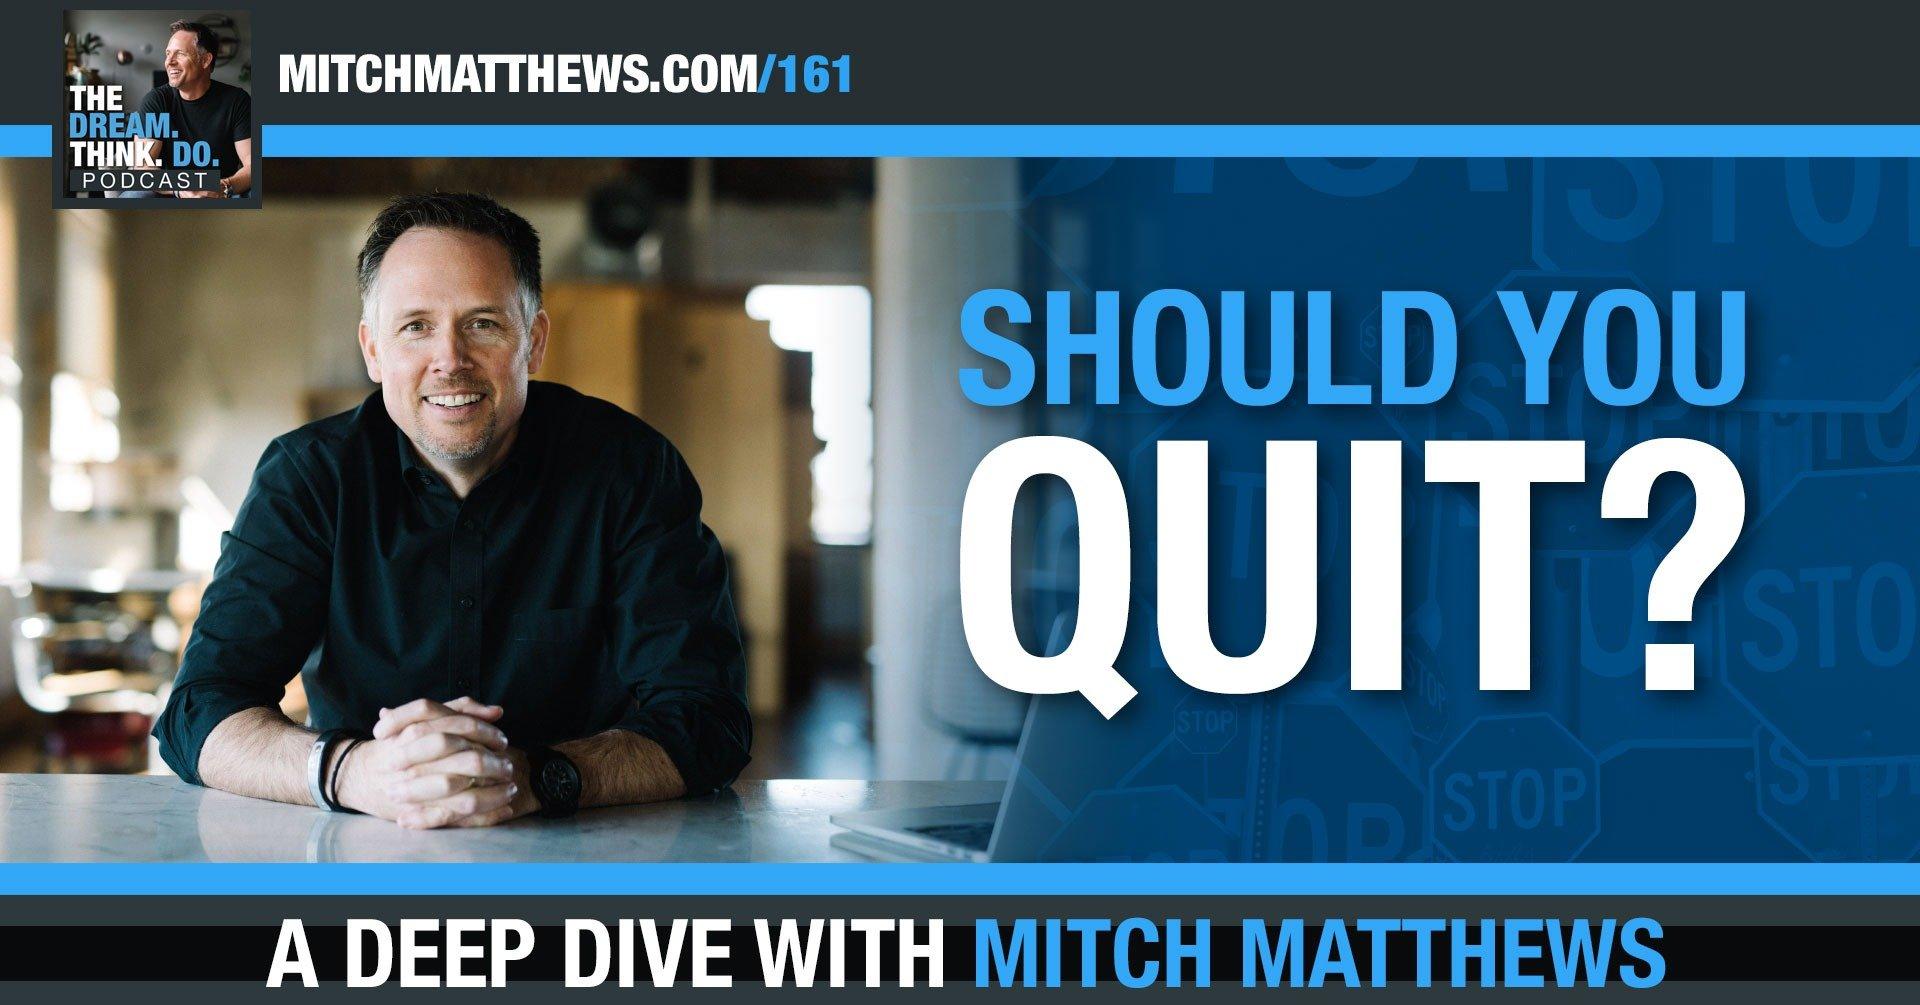 Should I Quit Mitch Matthews